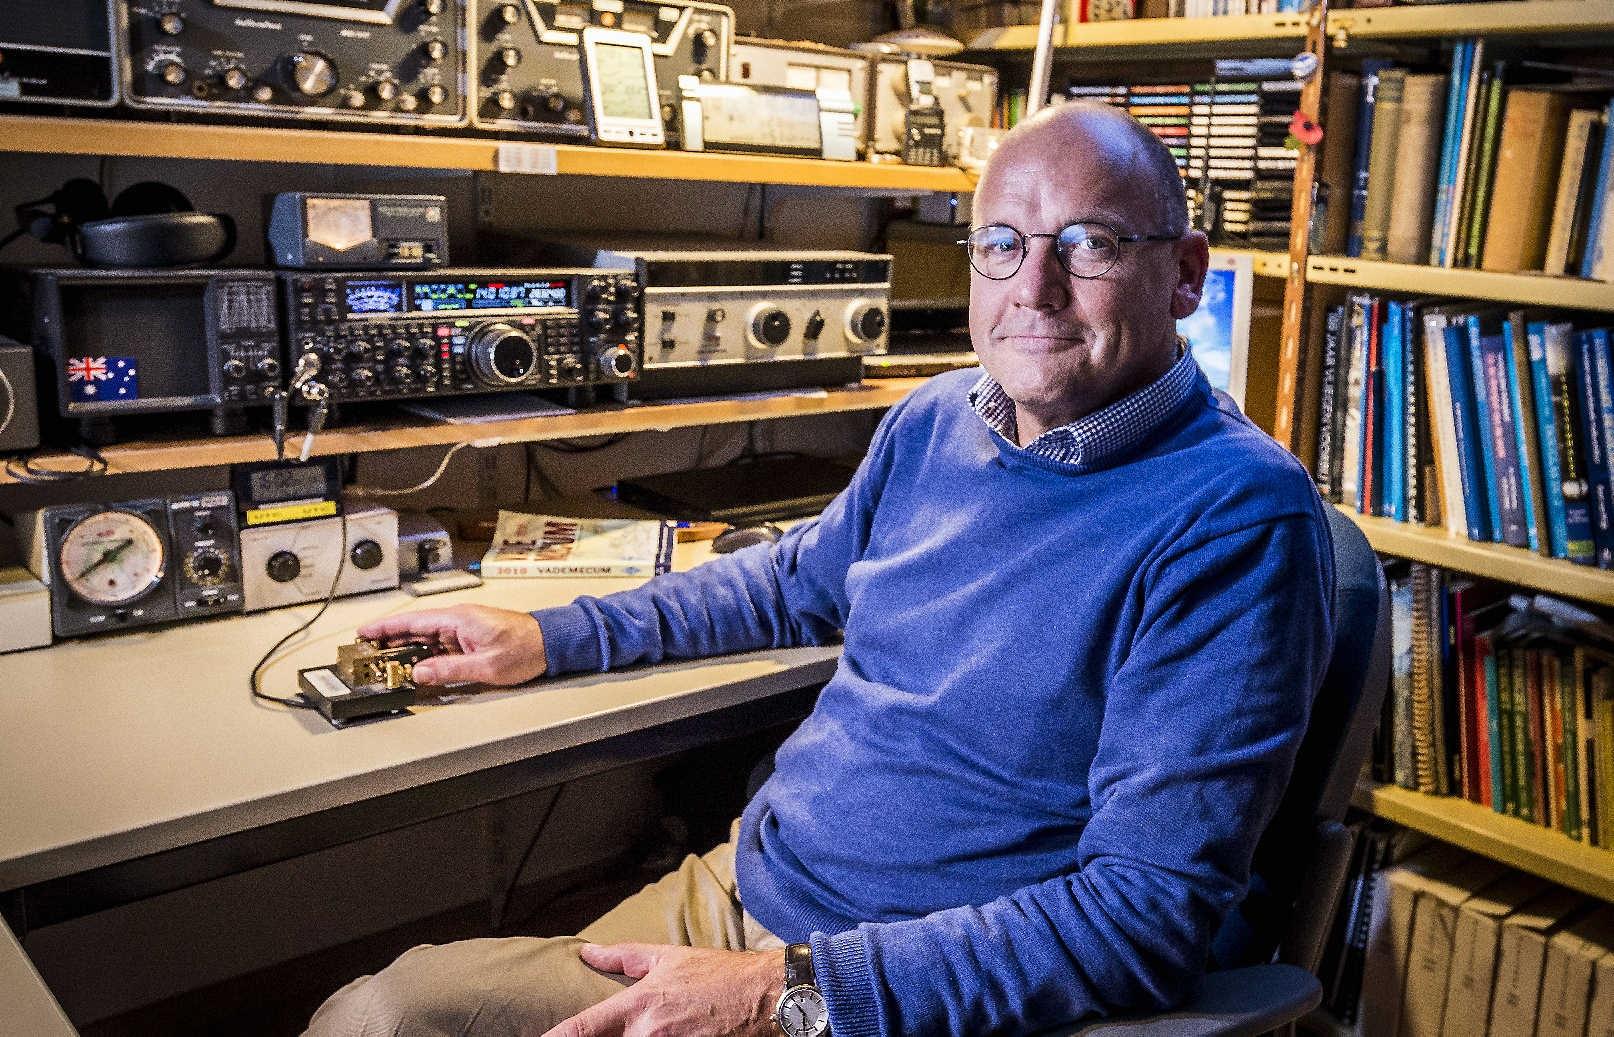 Ons land telt in dit digitale tijdperk toch nog zo'n 14.000 beoefenaars van de 'radiosport'